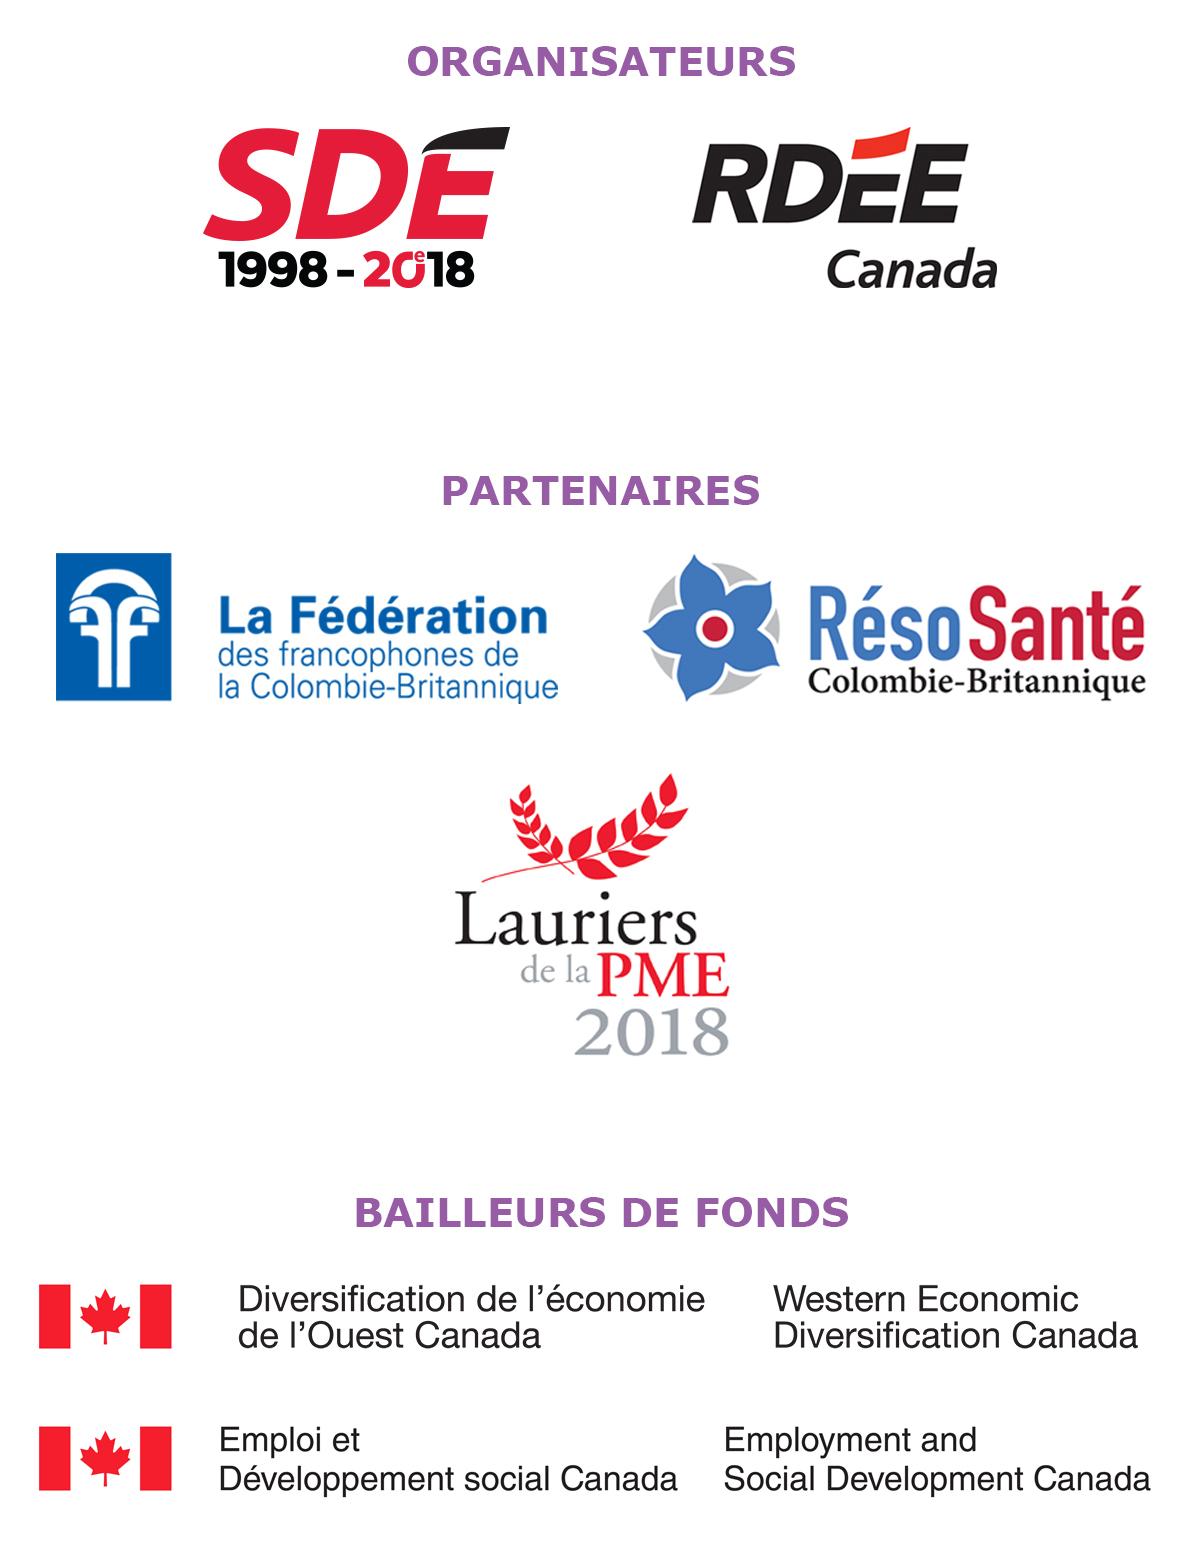 Logos_Organisateurs_Partenaires_BailleursdeFonds